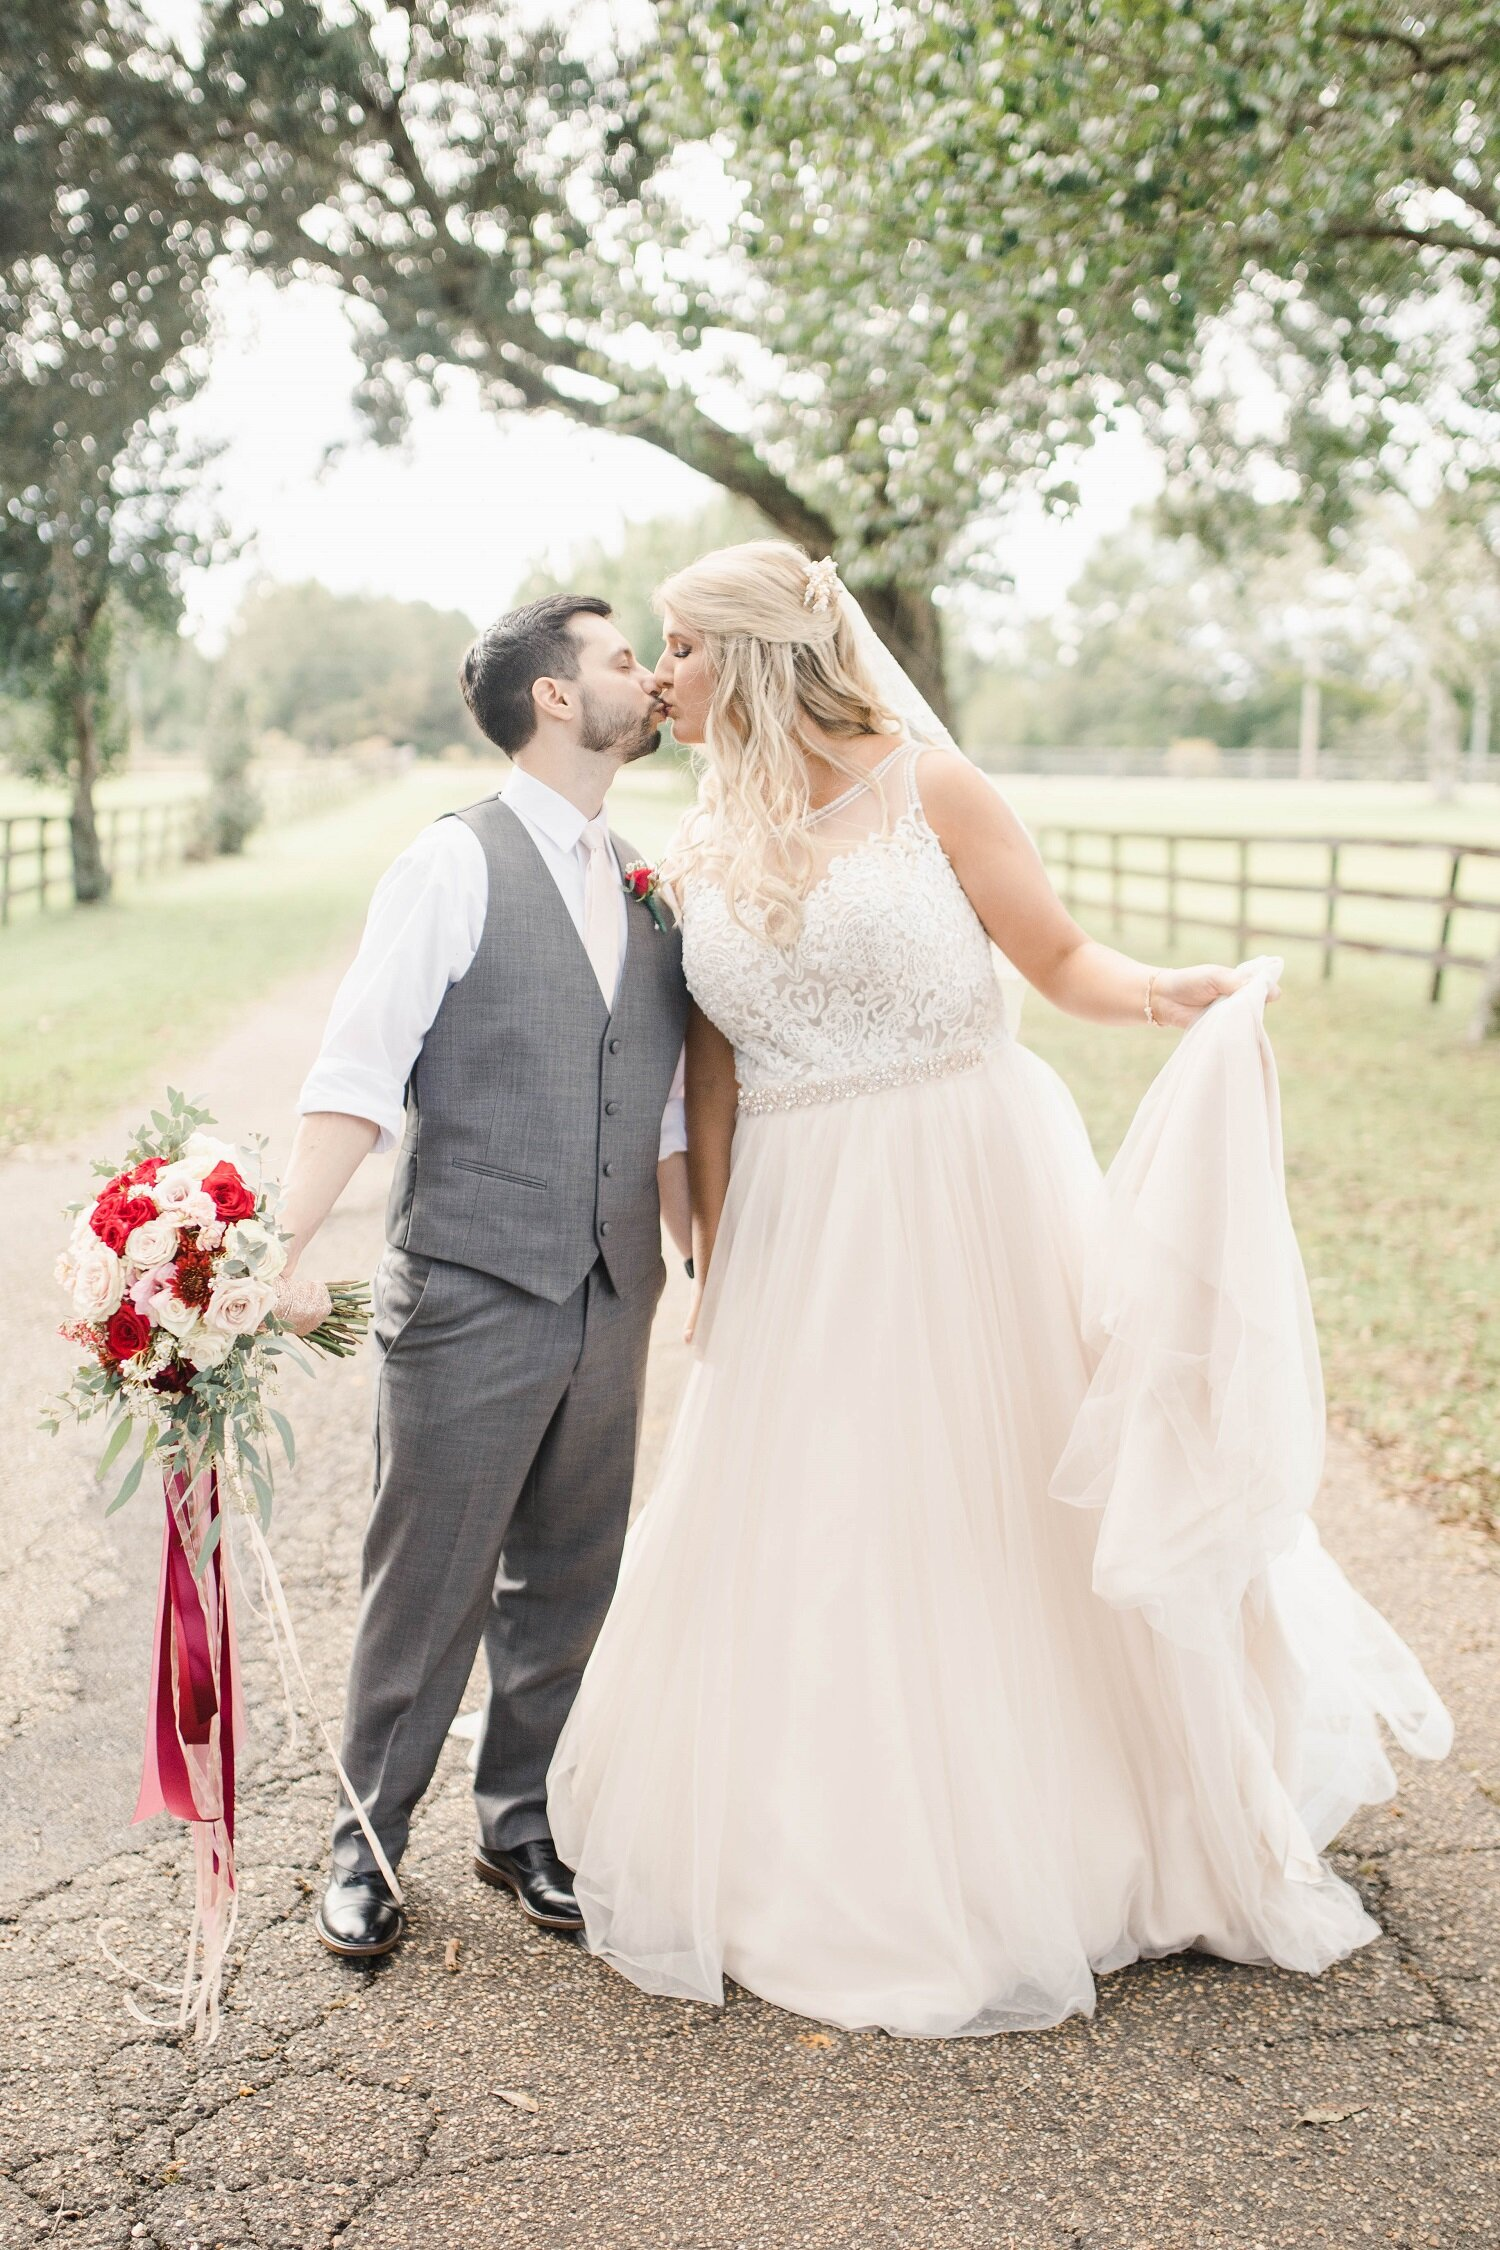 Martino Wedding - Shea's Favorites_-63.jpg